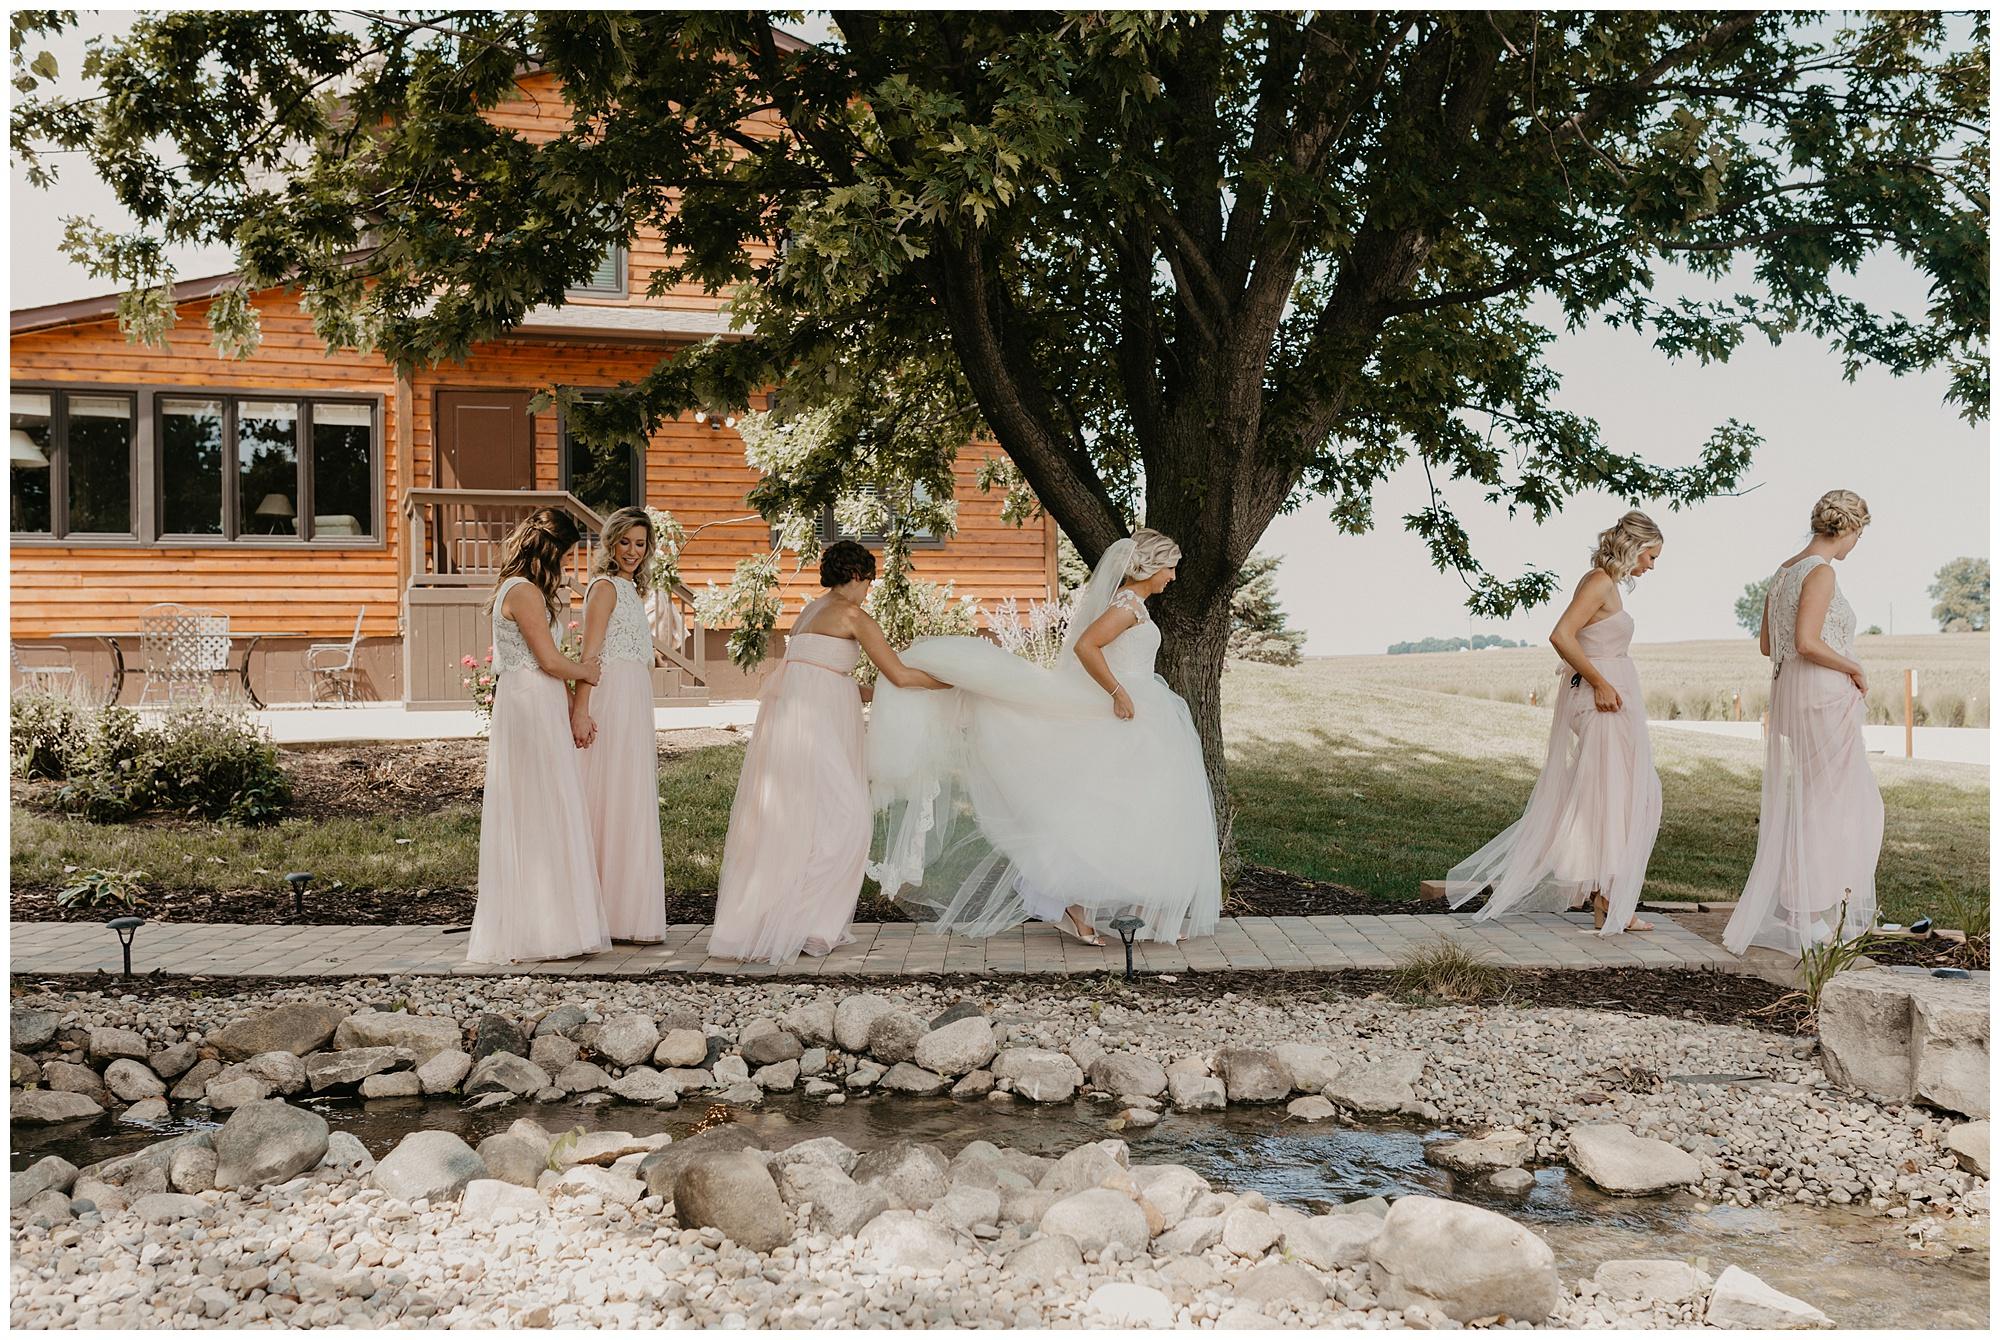 pear_tree_estate_wedding_champaign_il_wright_photographs_jj_0074.jpg